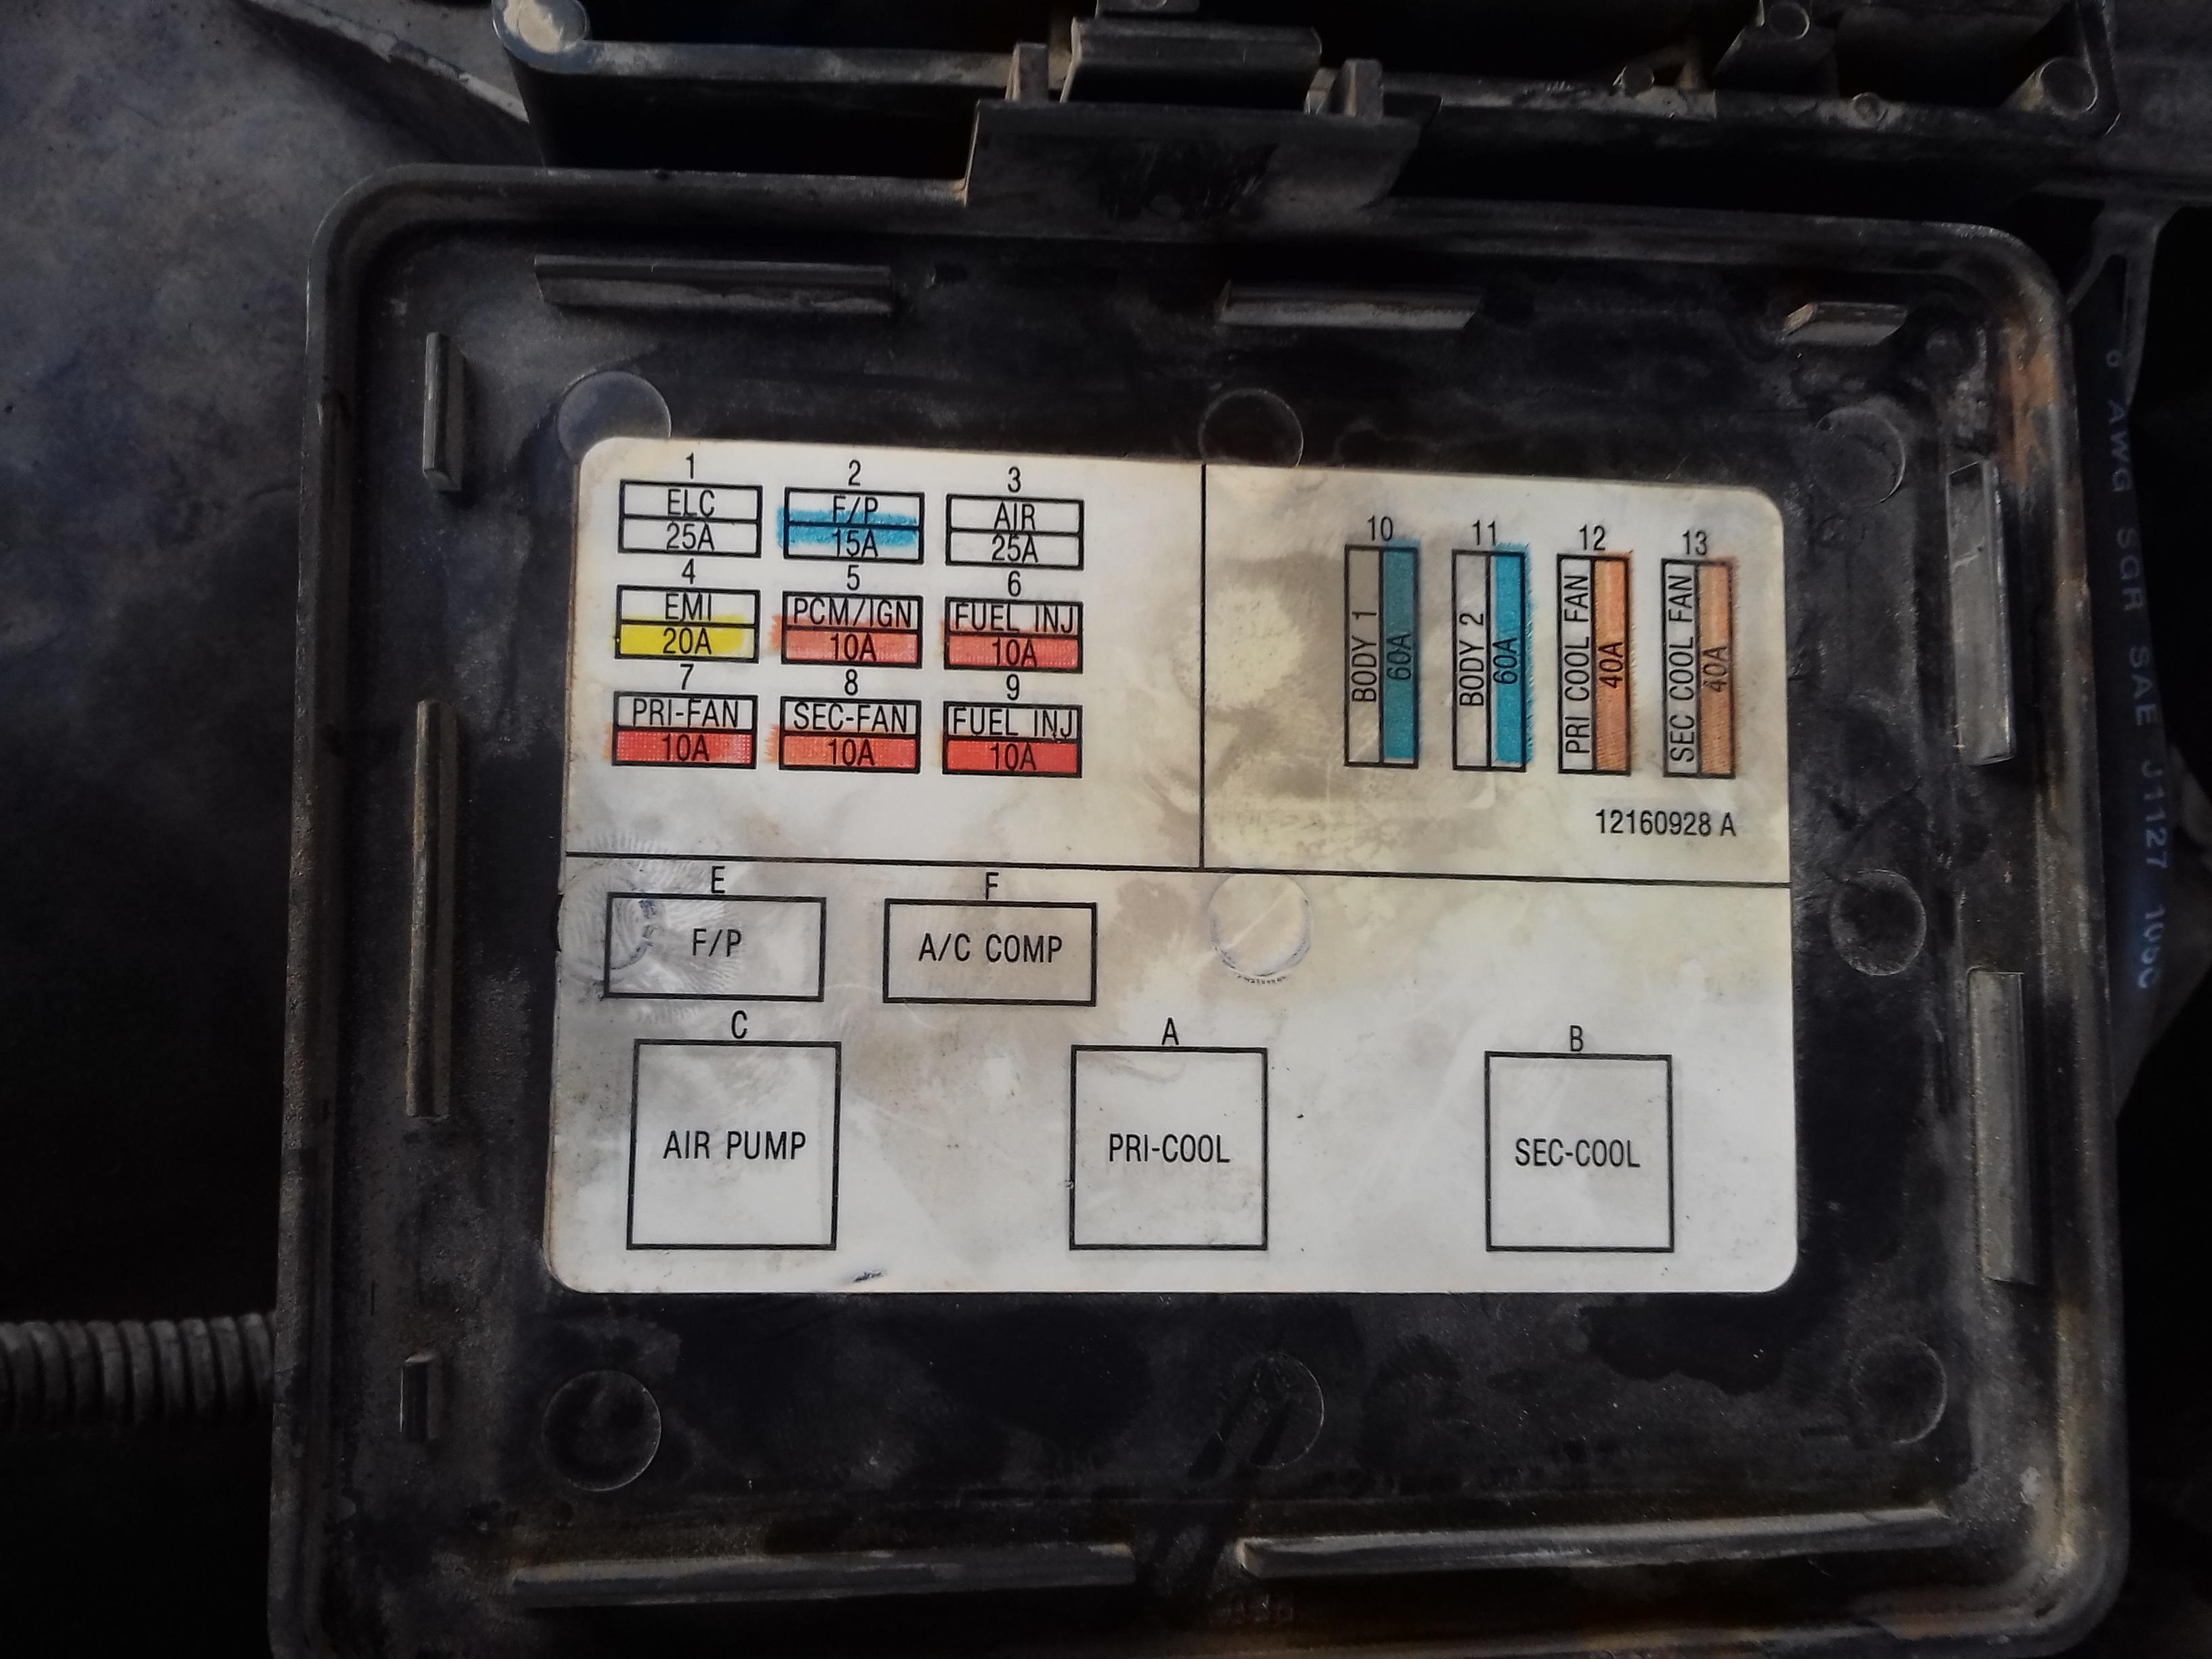 96 Impala Fuse Box | Wiring Diagram on